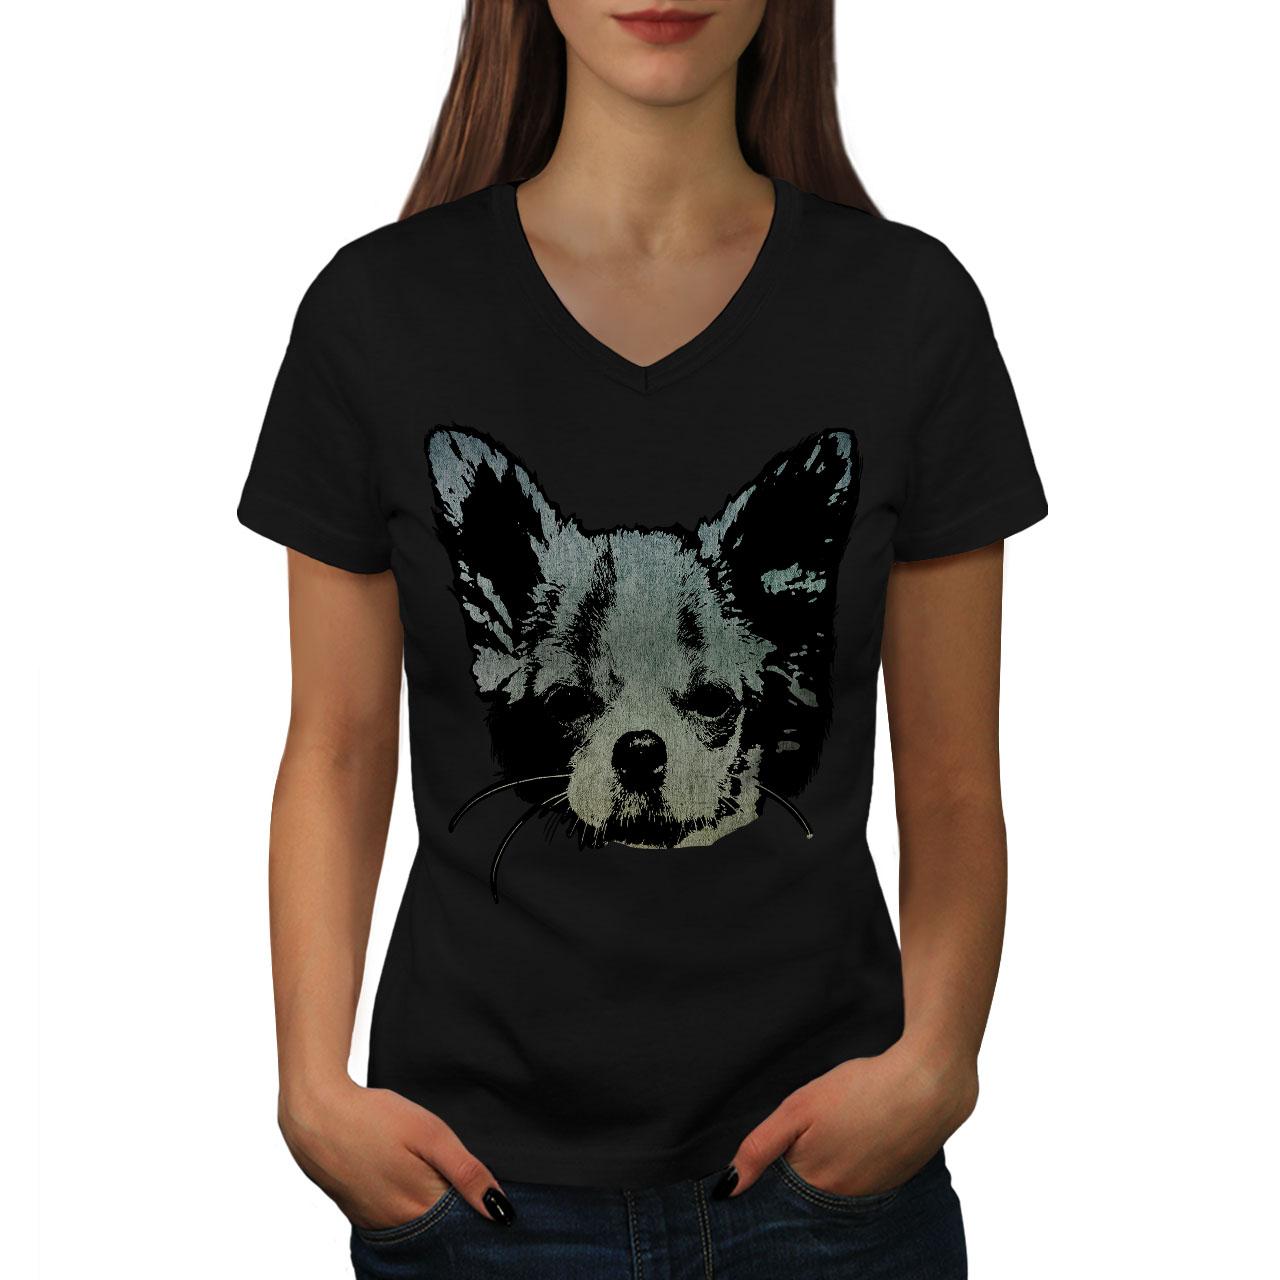 Prestige Casual Design Wellcoda Chihuahua Face Cute Womens Long Sleeve T-shirt